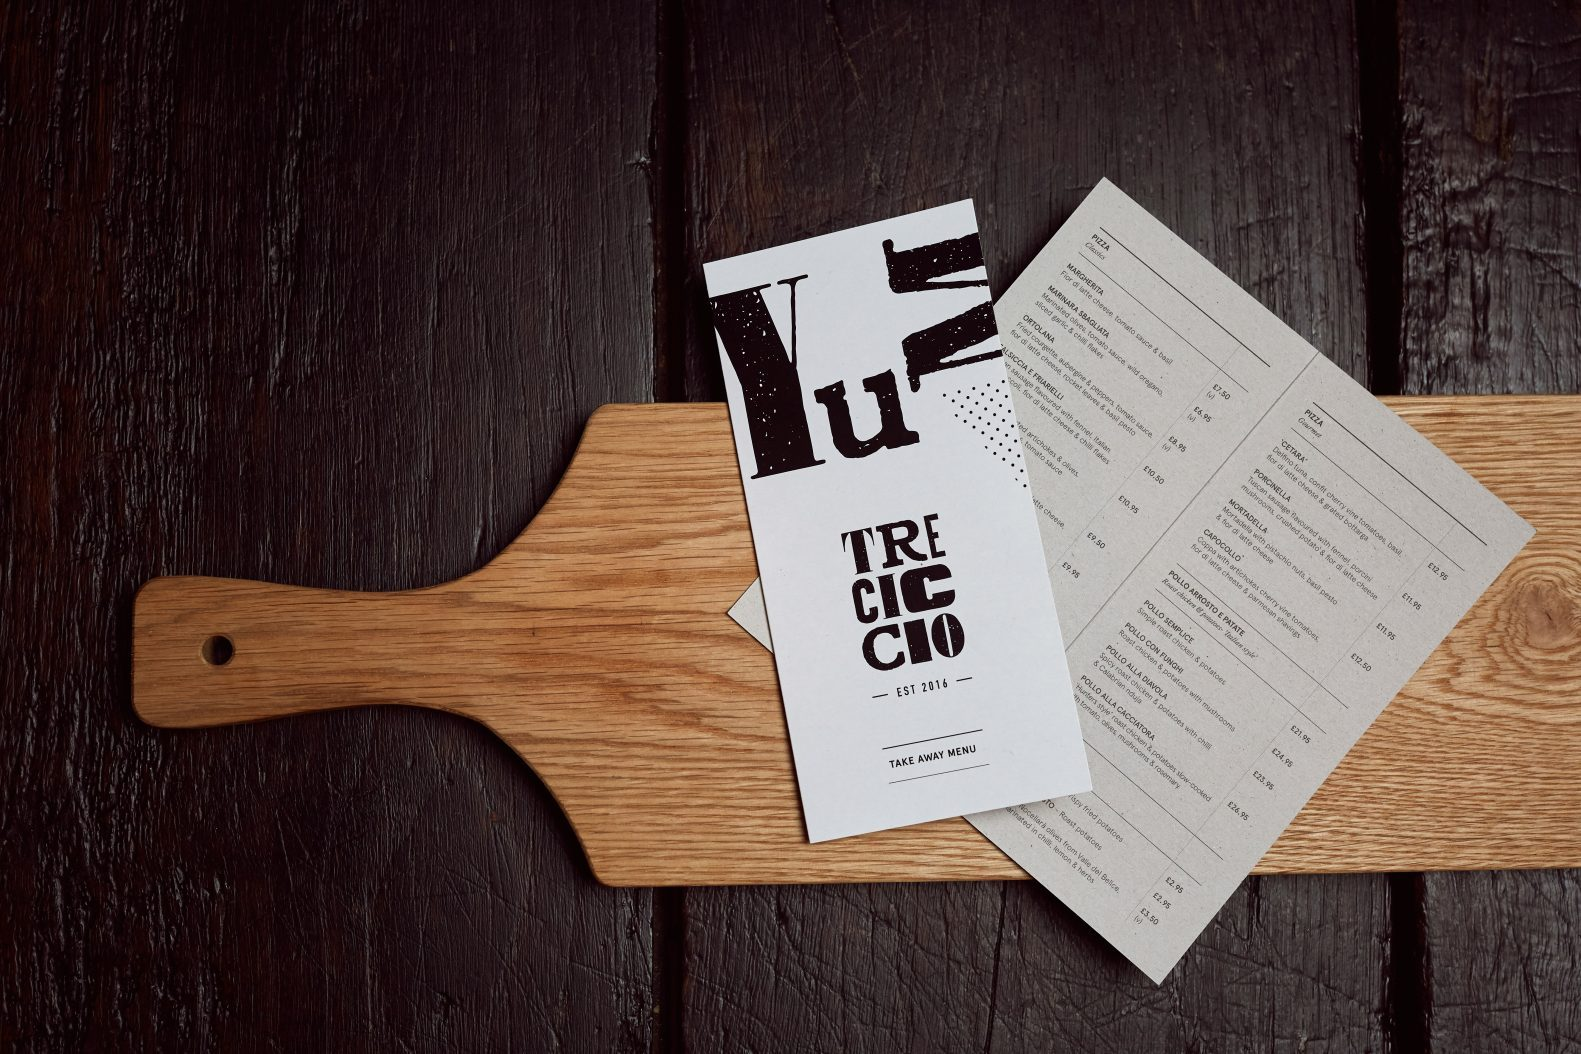 Tre Ciccio Menu Card Design by Phaus